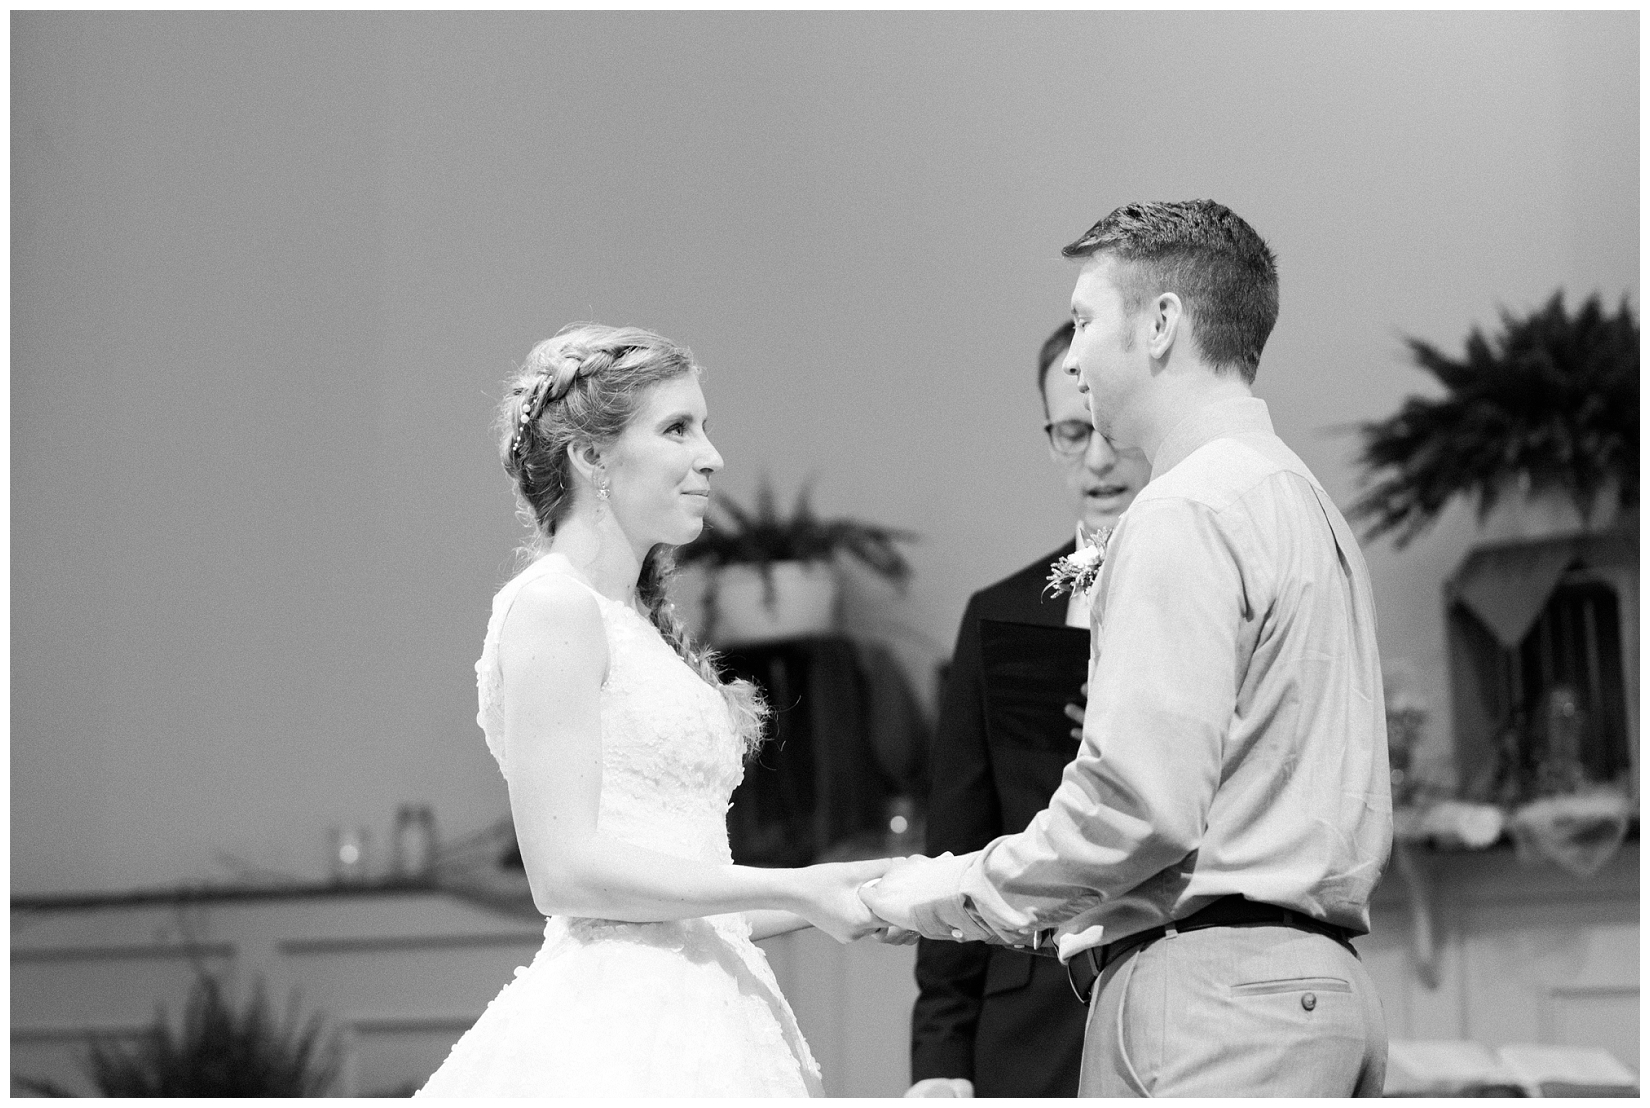 cat-alkire-wedding-photographer-indiana-chicago-indianapolis-fort-wayne_1318.jpg